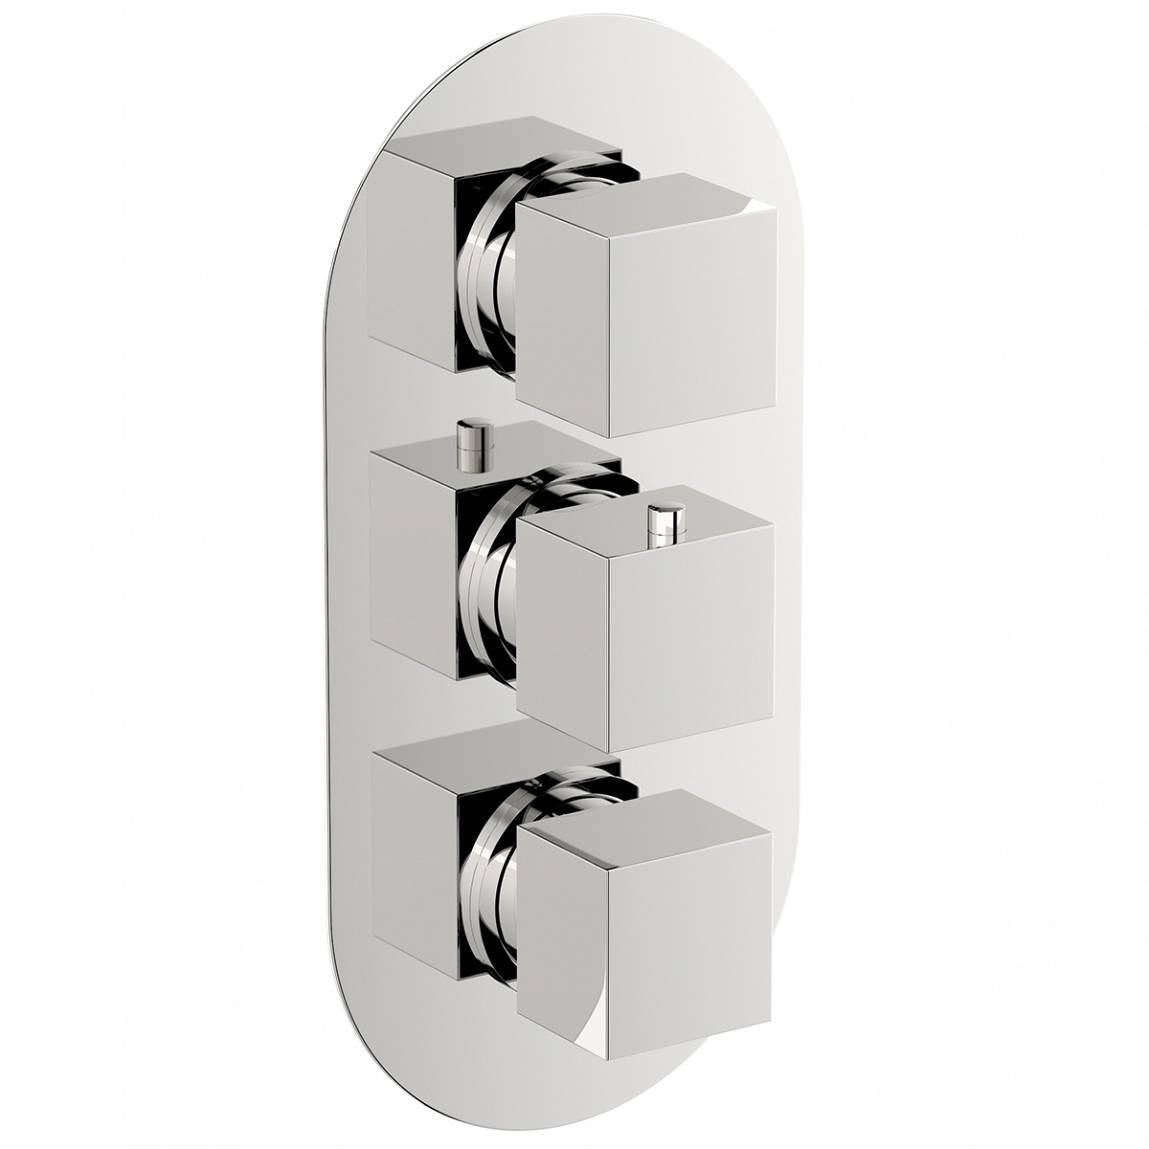 Mode Cubik oval triple thermostatic shower valve with diverter